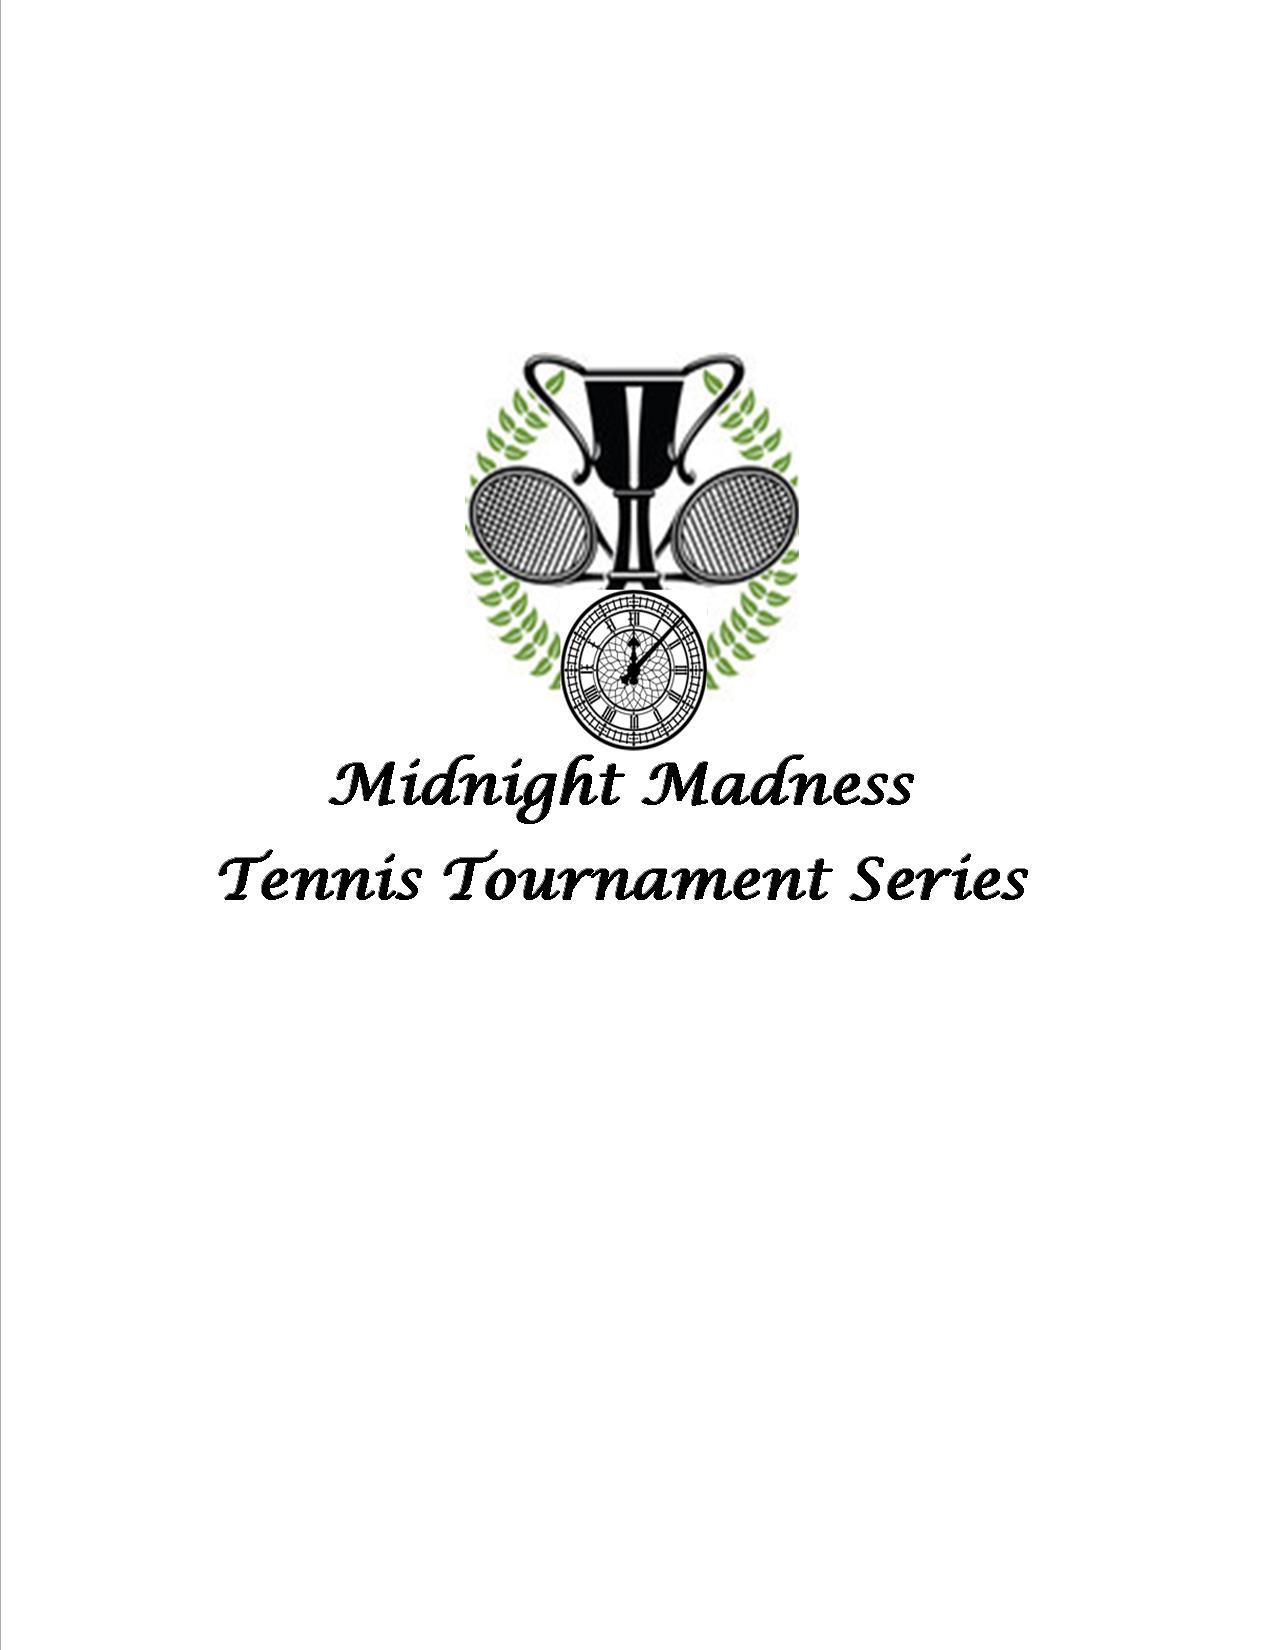 Midnight Madness Tennis Tournament Series